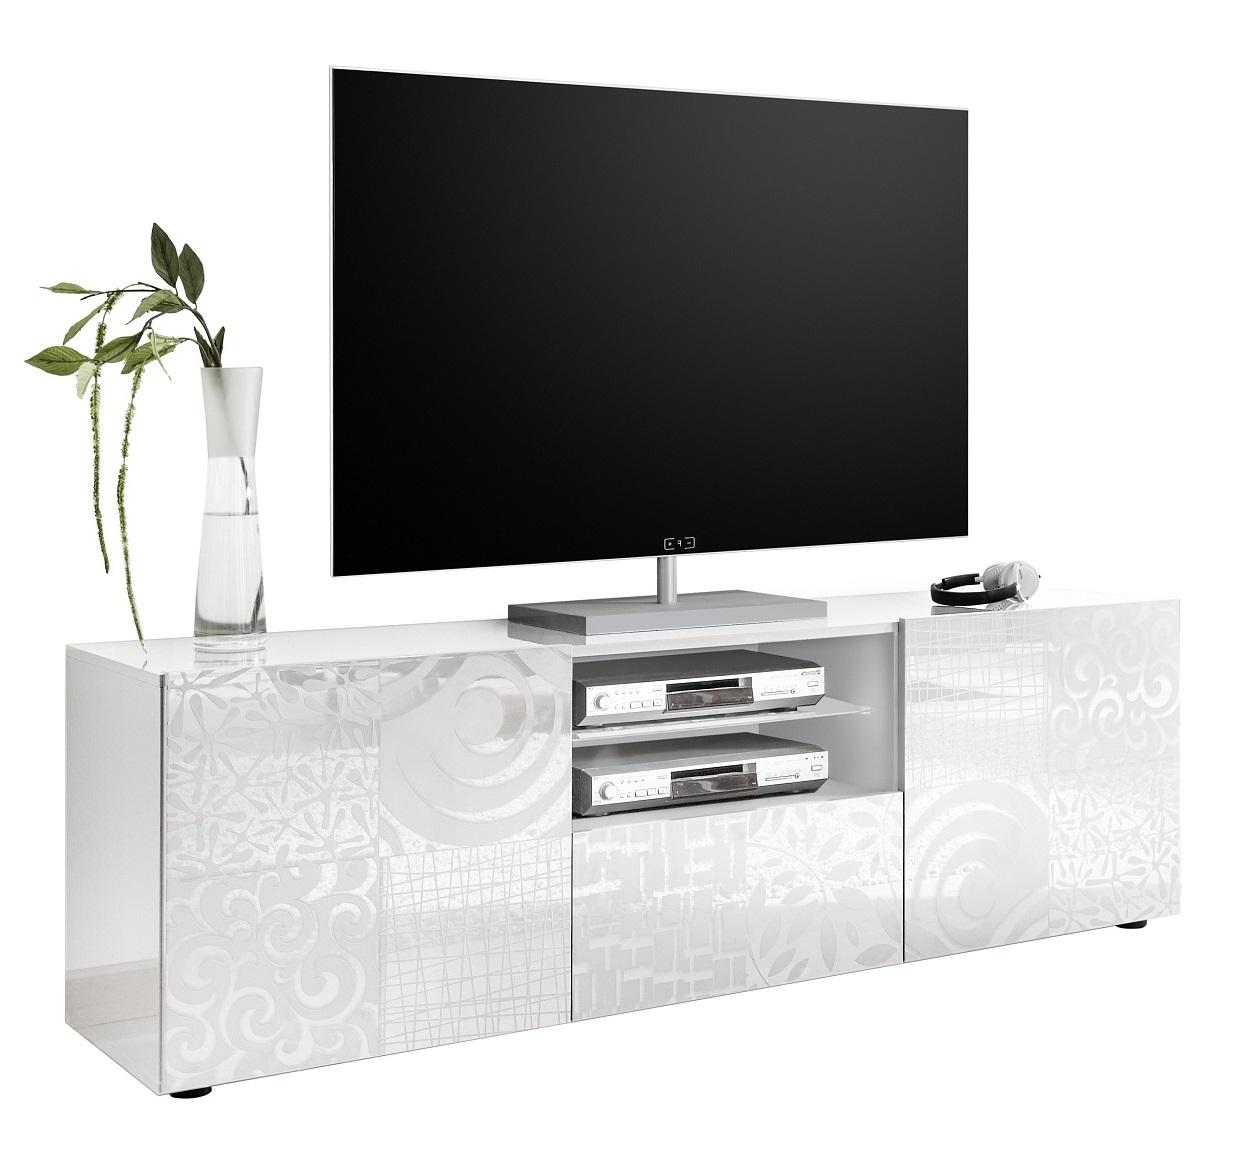 Tv-meubel Miro 181 cm breed in hoogglans wit